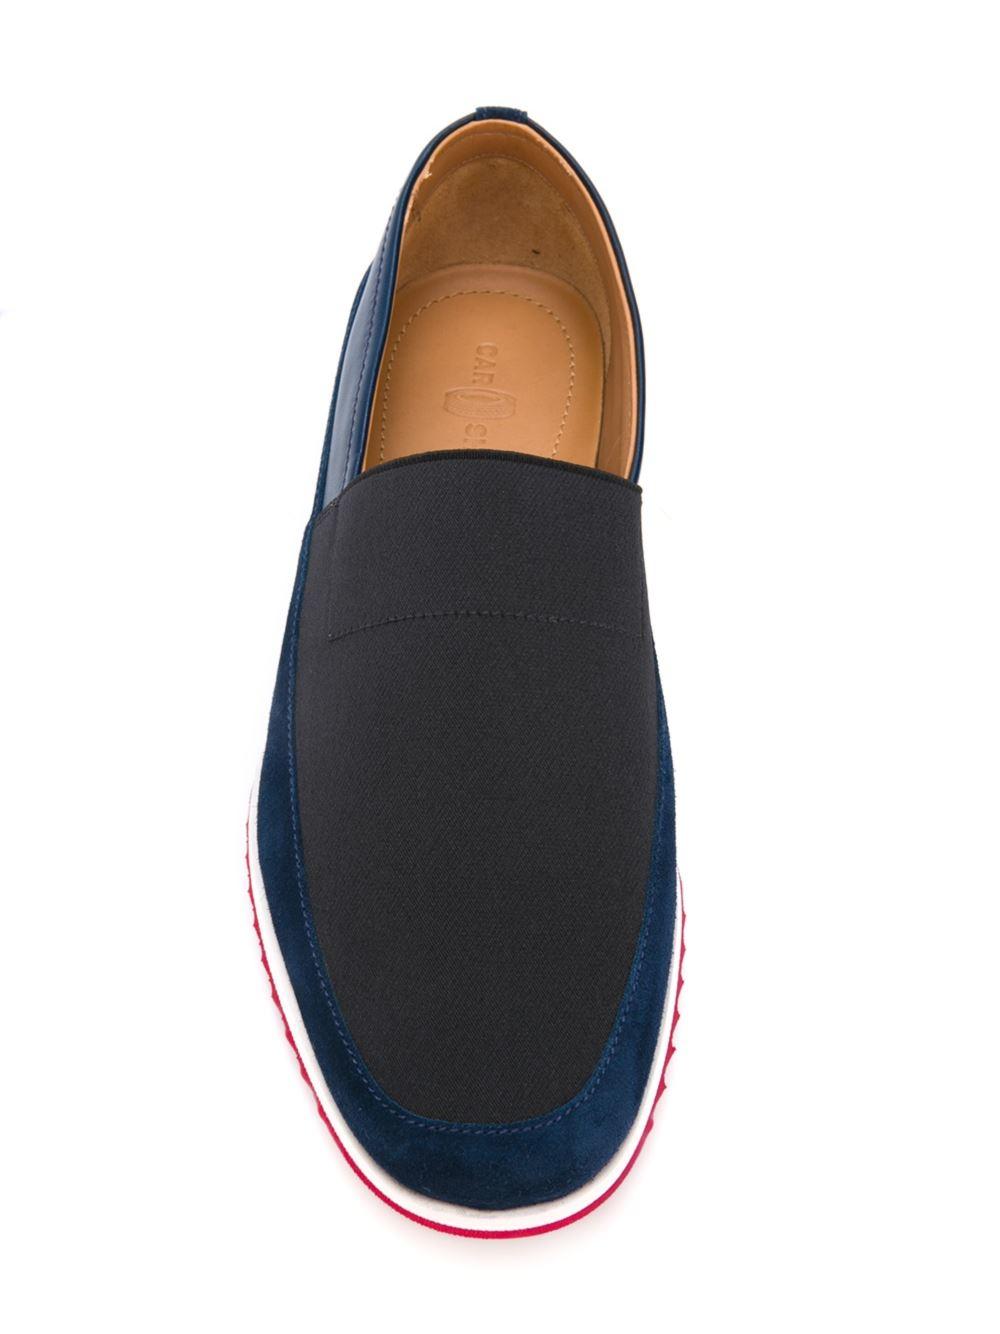 Car Shoe Rigid Sole Boat Shoes In Black For Men Lyst